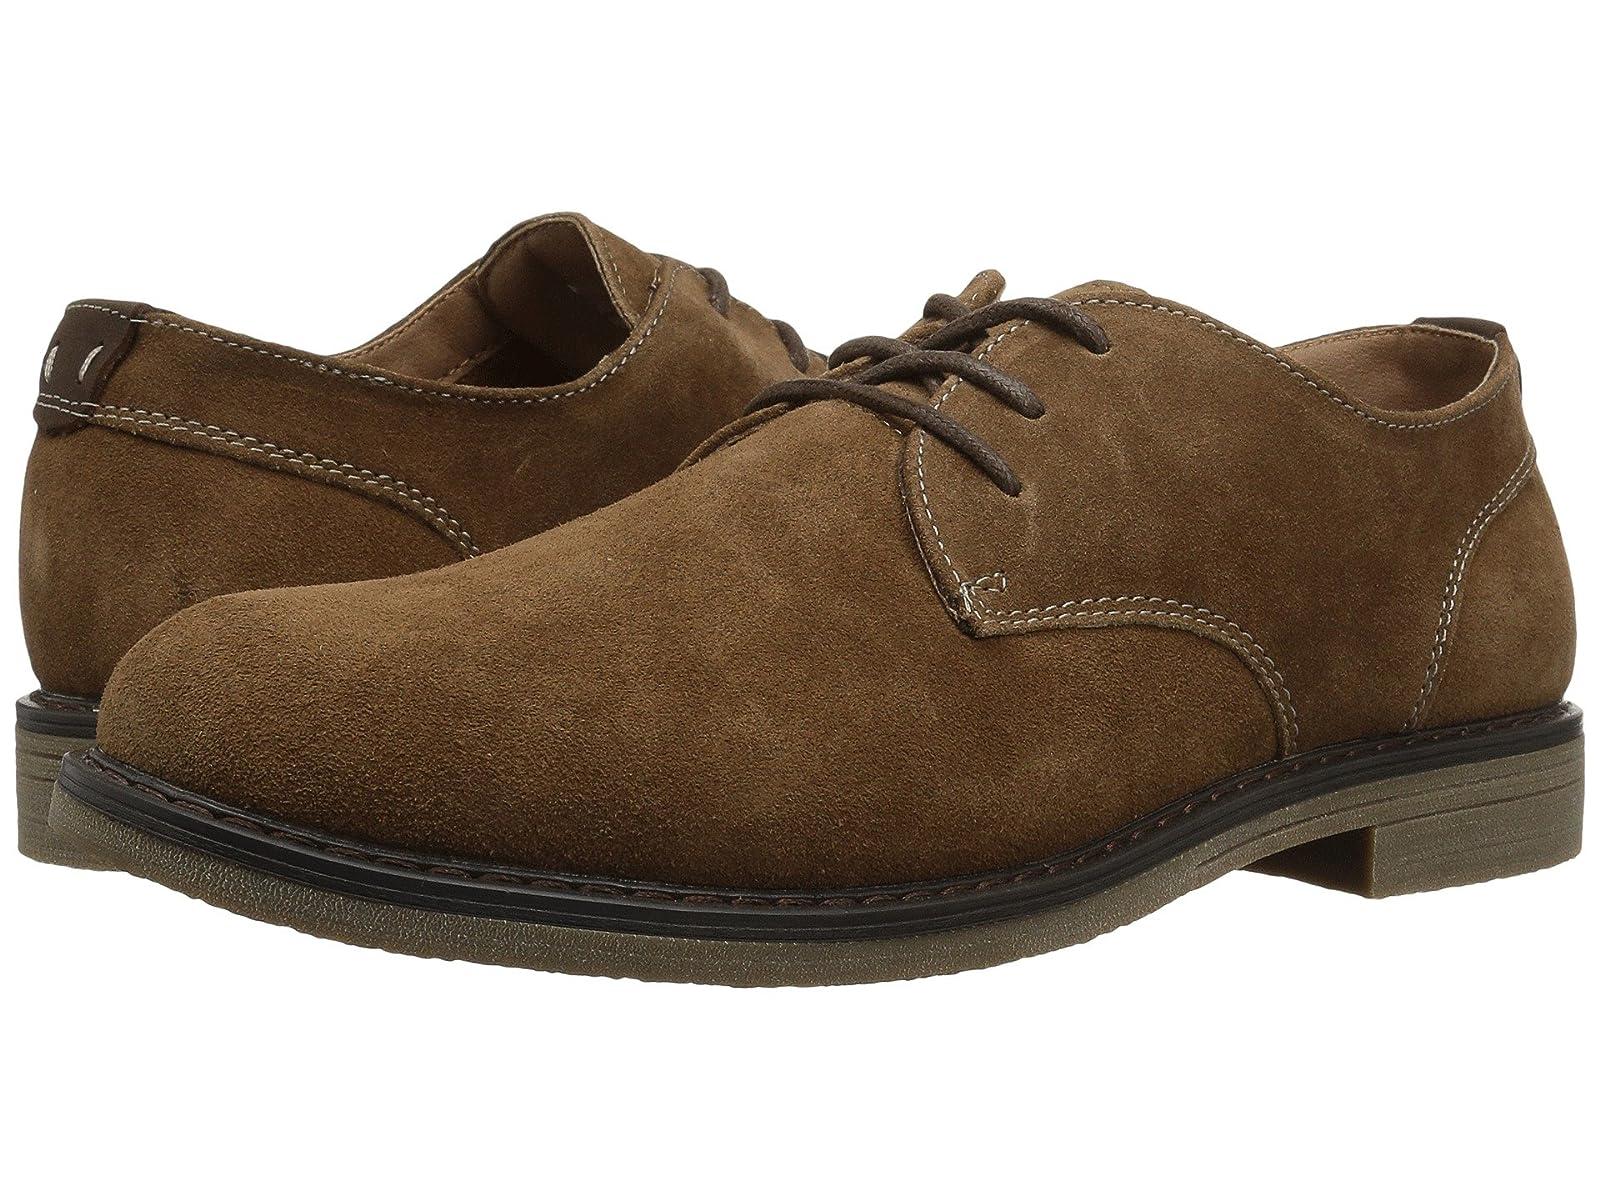 Nunn Bush Linwood Plain Toe OxfordAtmospheric grades have affordable shoes